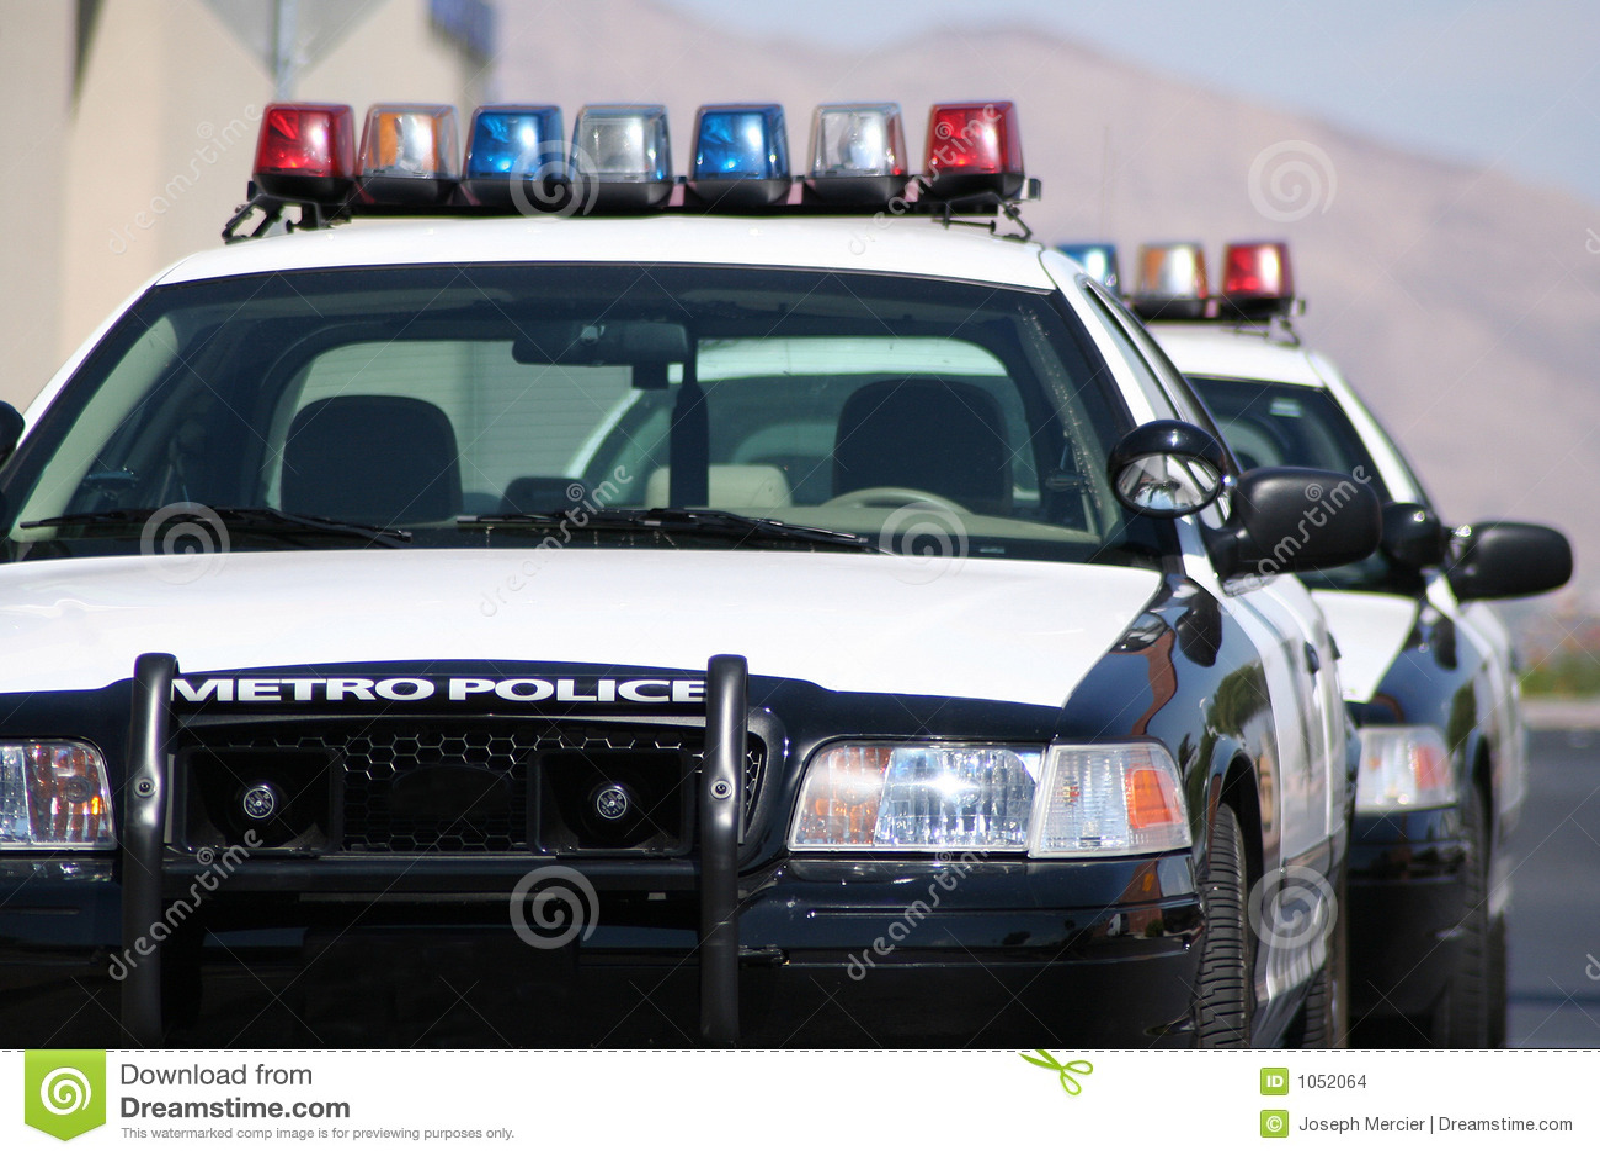 Metro Police Cars